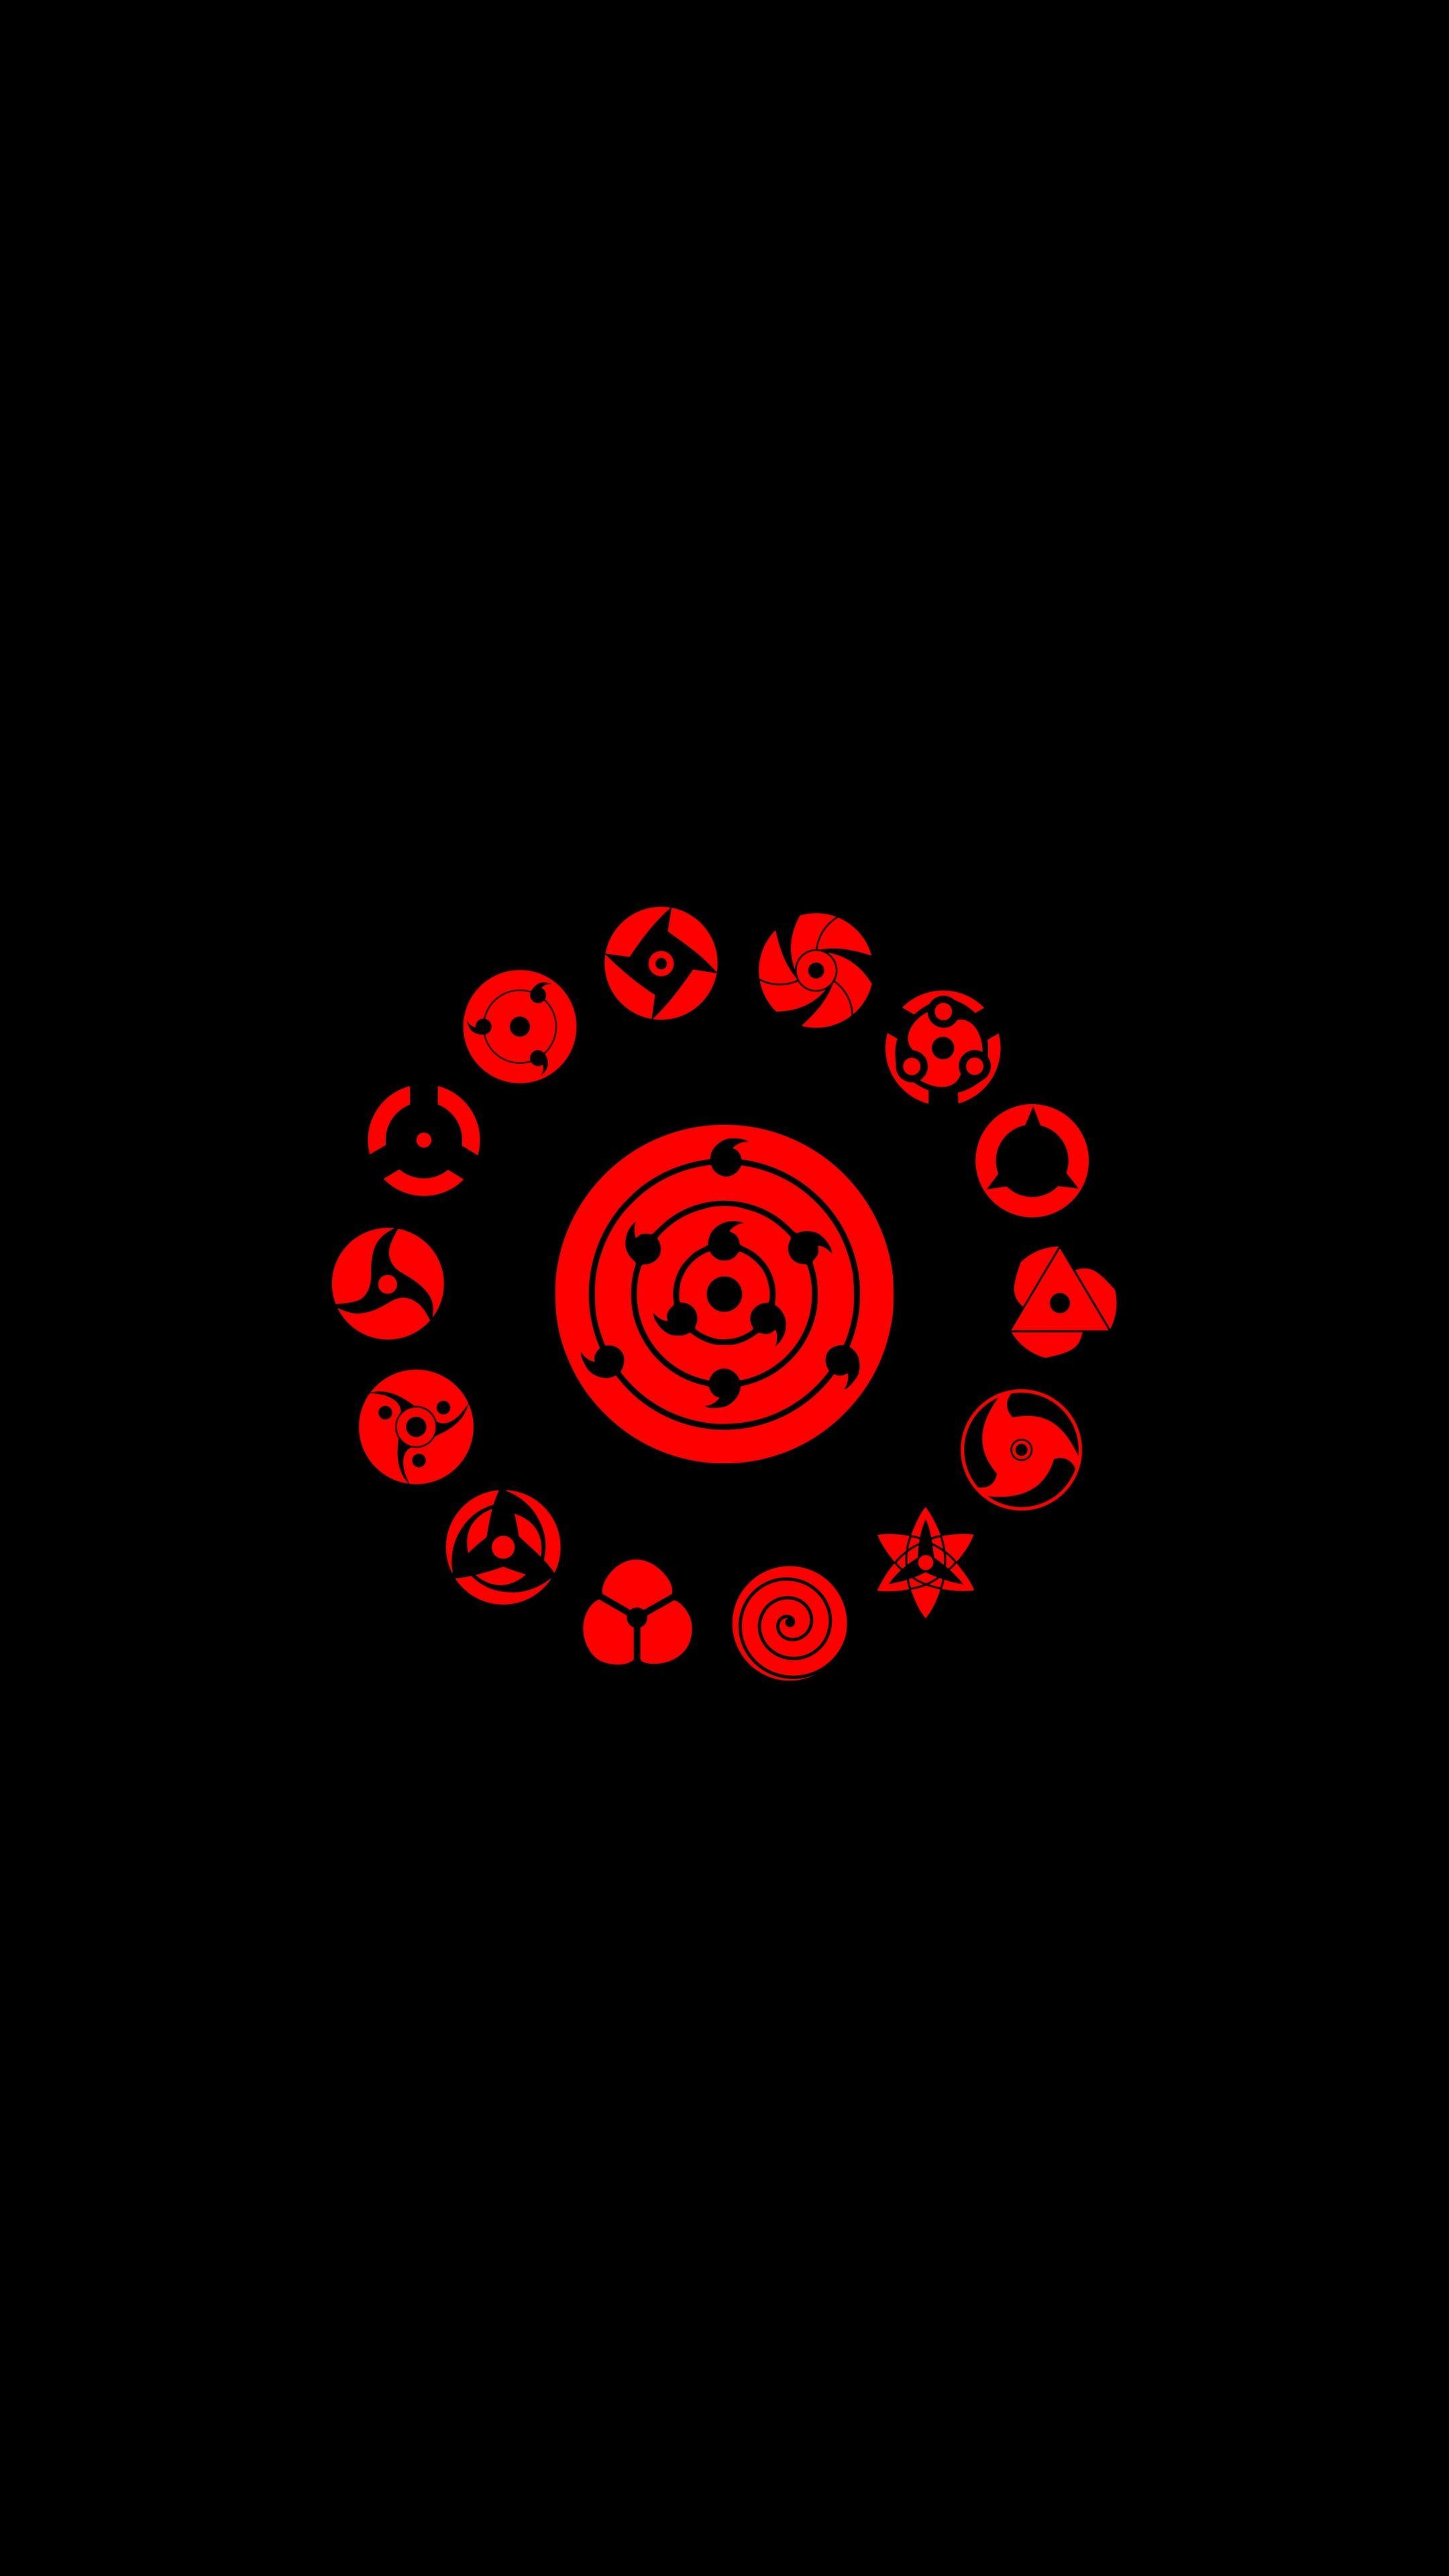 Download 2160x3840 Wallpaper Logo Minimal Naruto 4k Sony